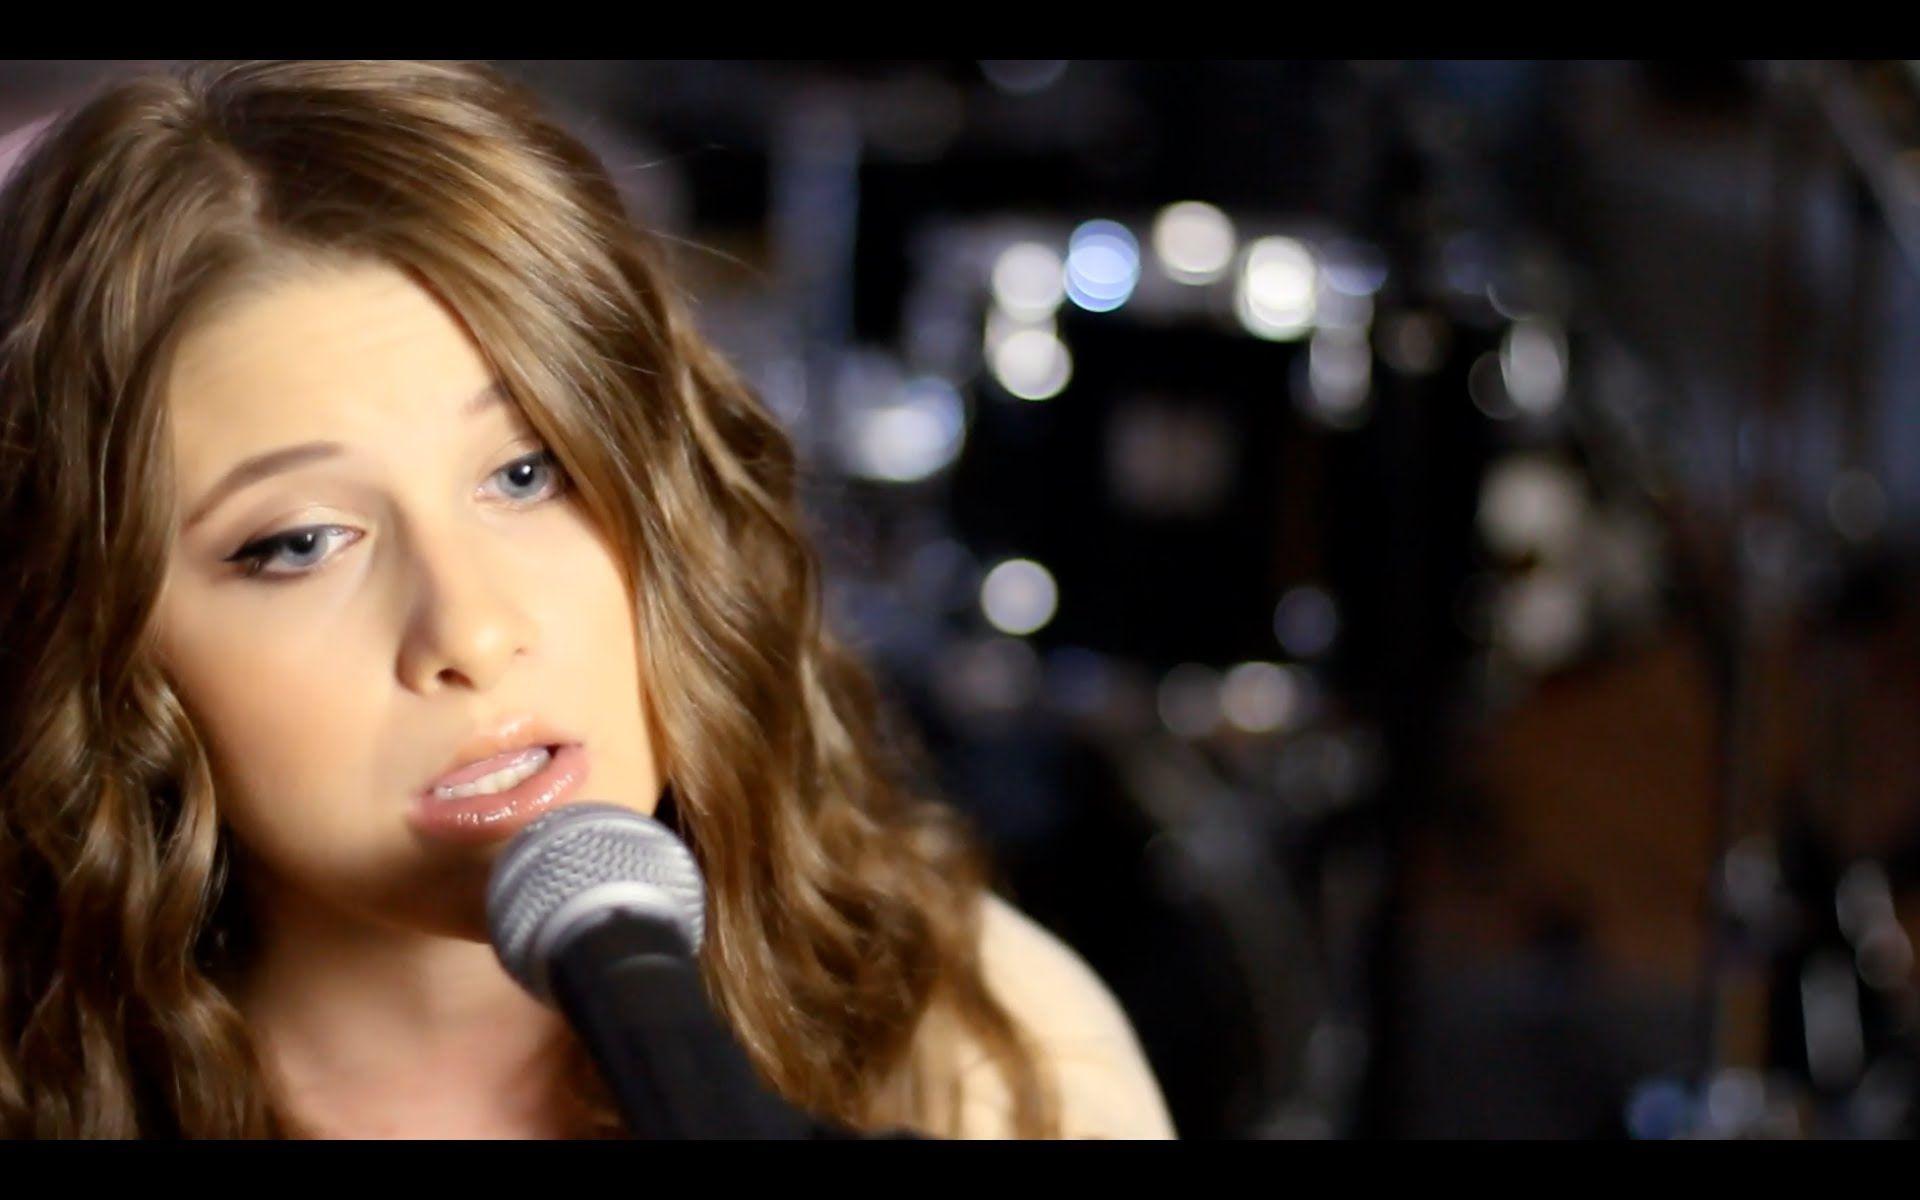 OneRepublic - Come Home - Official Acoustic Music Video - Savannah Outen...